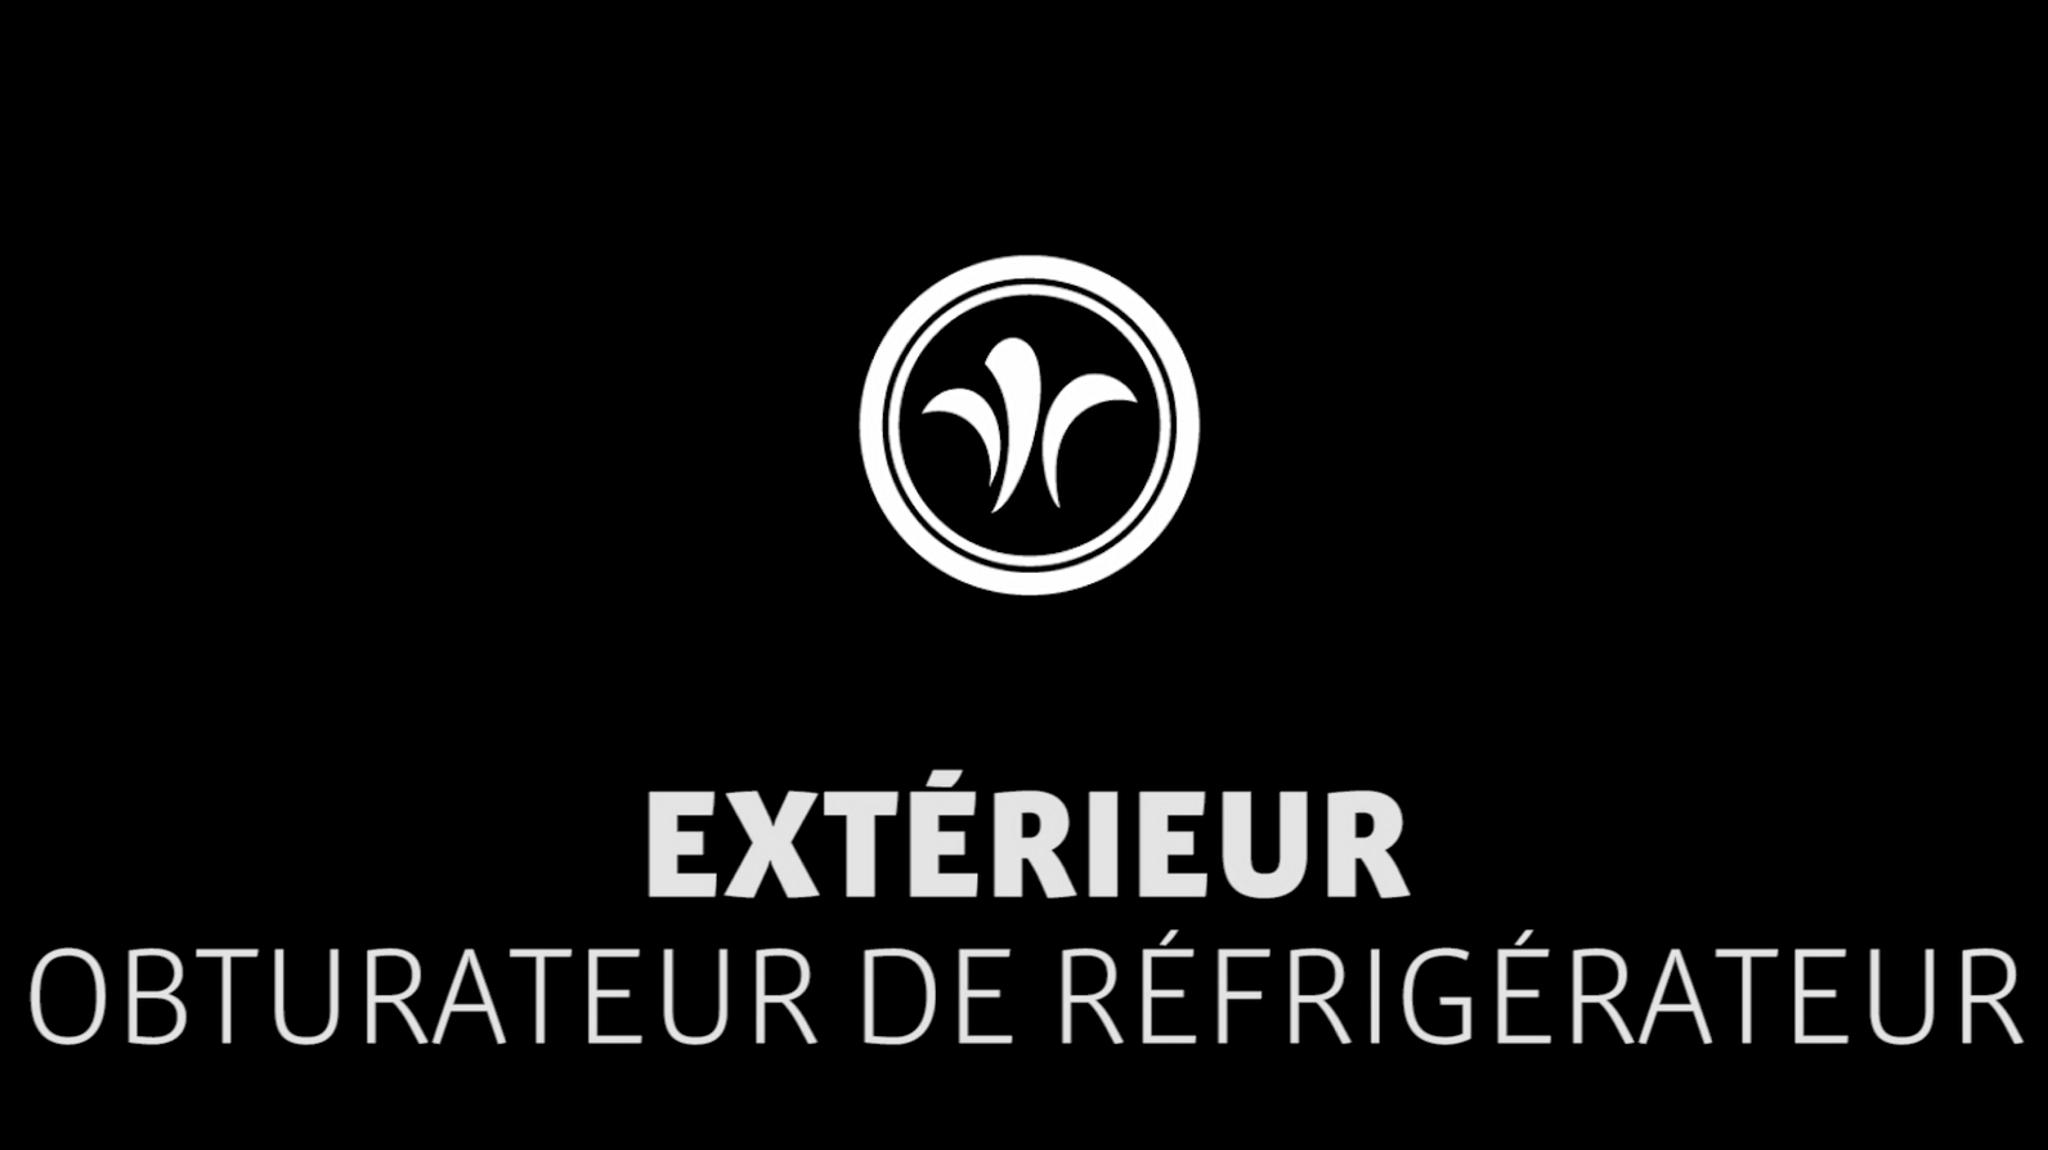 Housse pour camping-car // Niesmann+Bischoff - Camping-car de luxe (modèle FLAIR) // 2019 // EX7